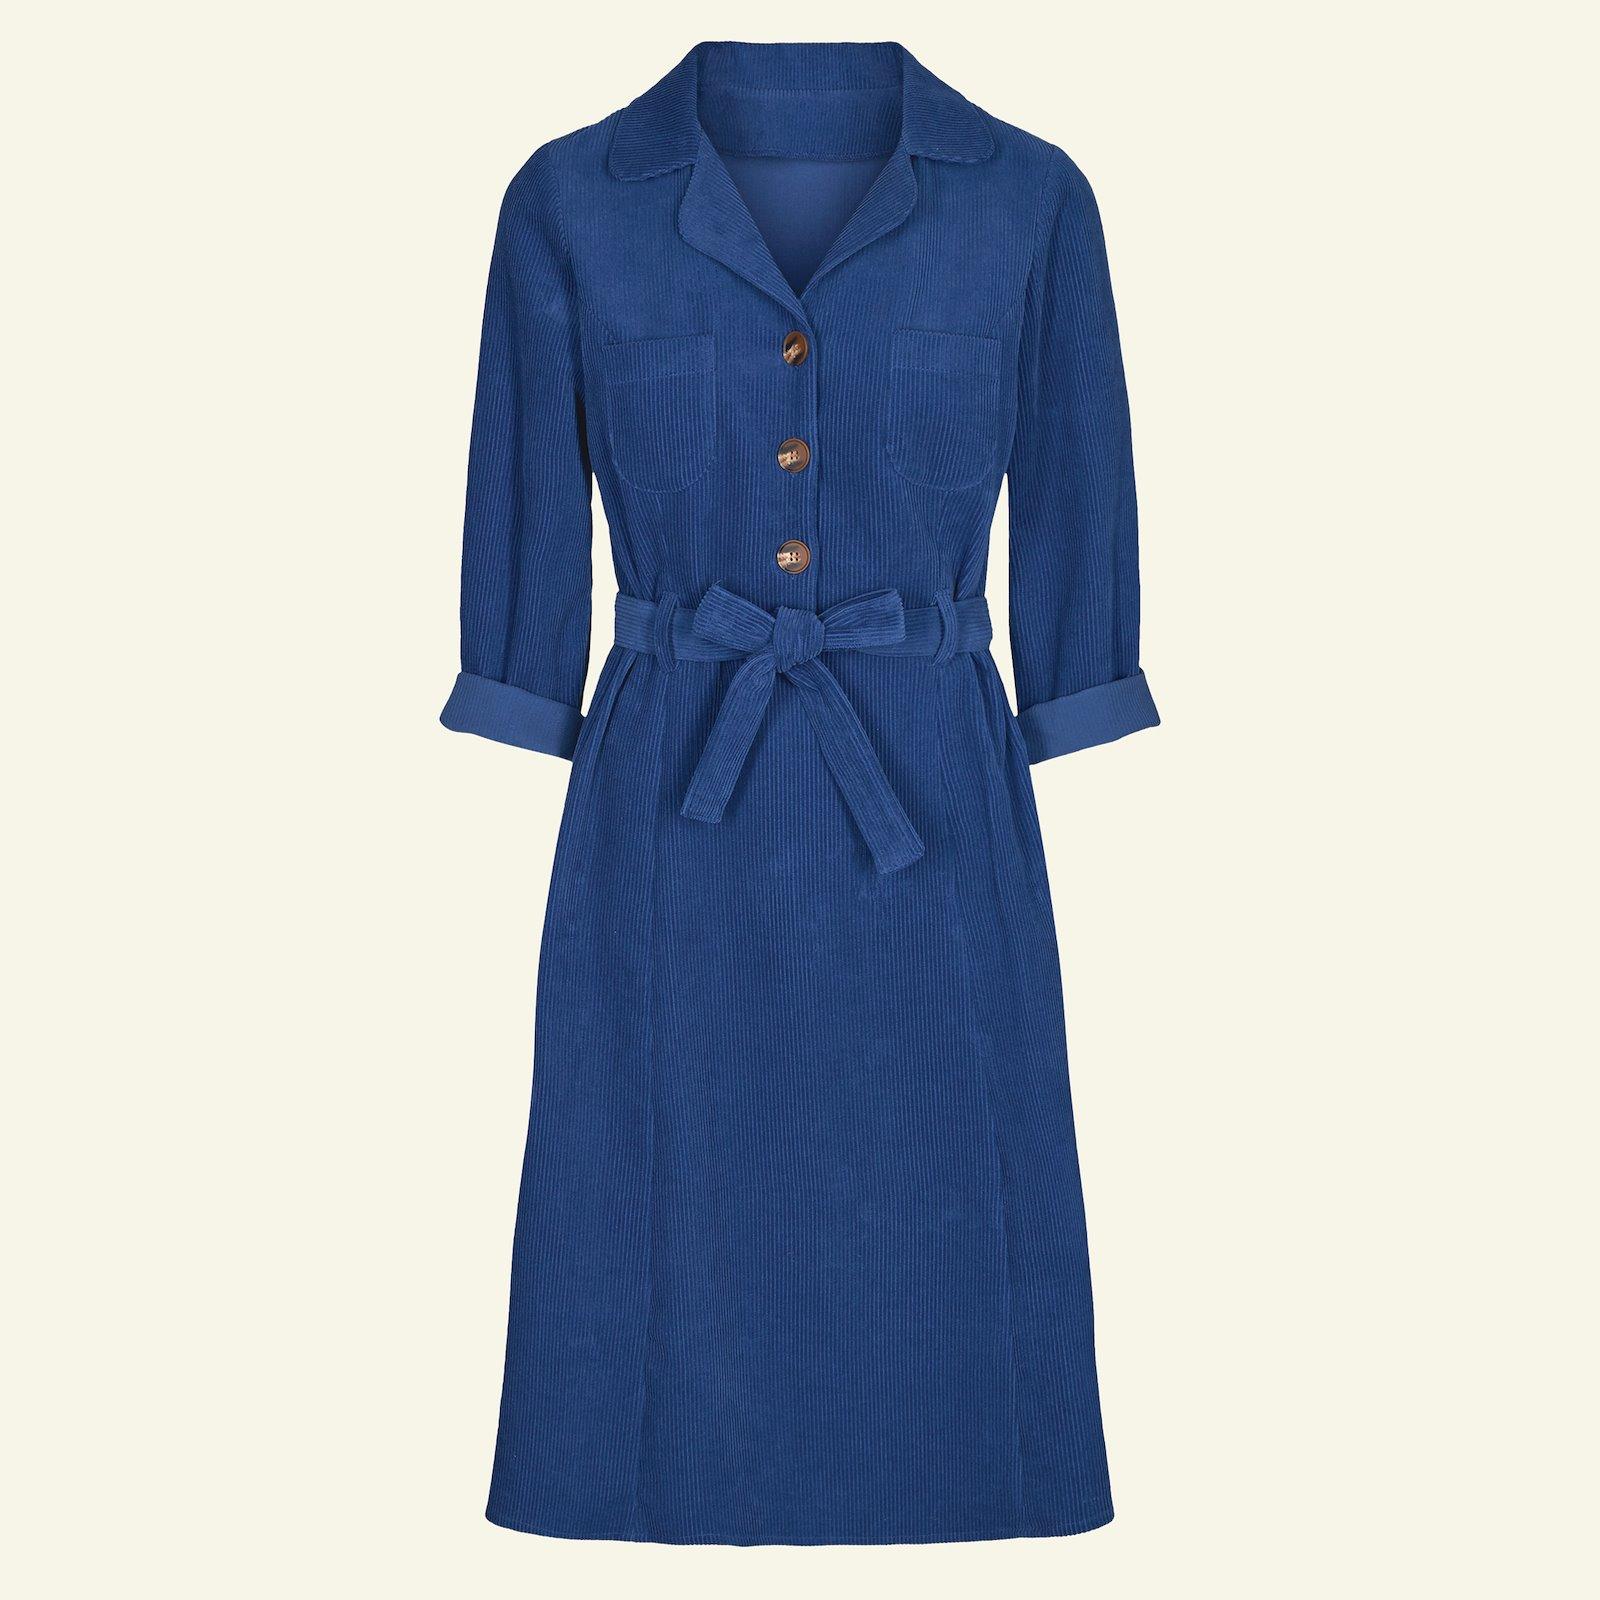 Dress, 44/16 p23075_430820_40243_sskit